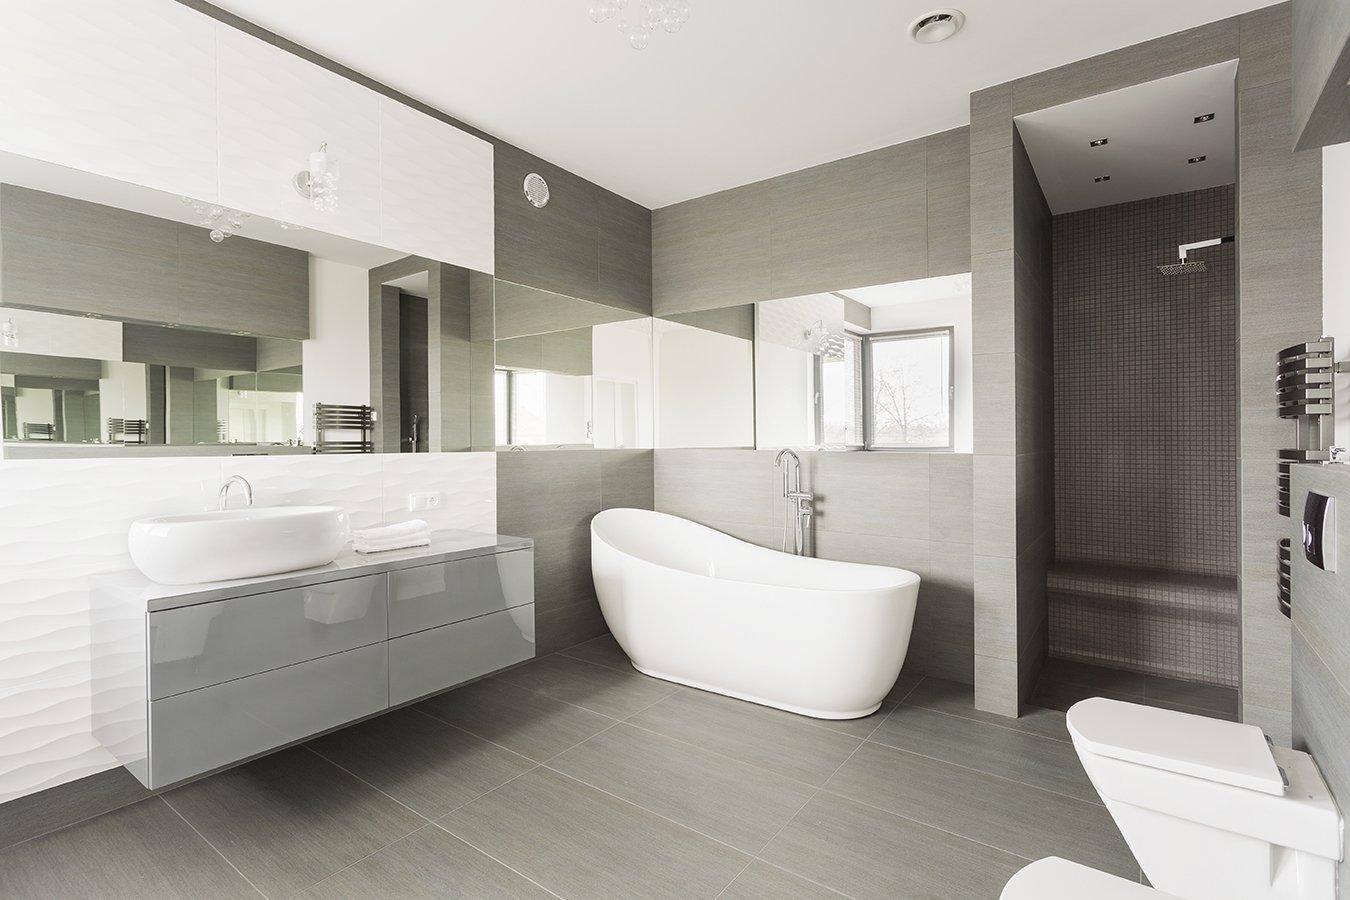 Bathroom Renovations Gas and Plumbing Brisbane